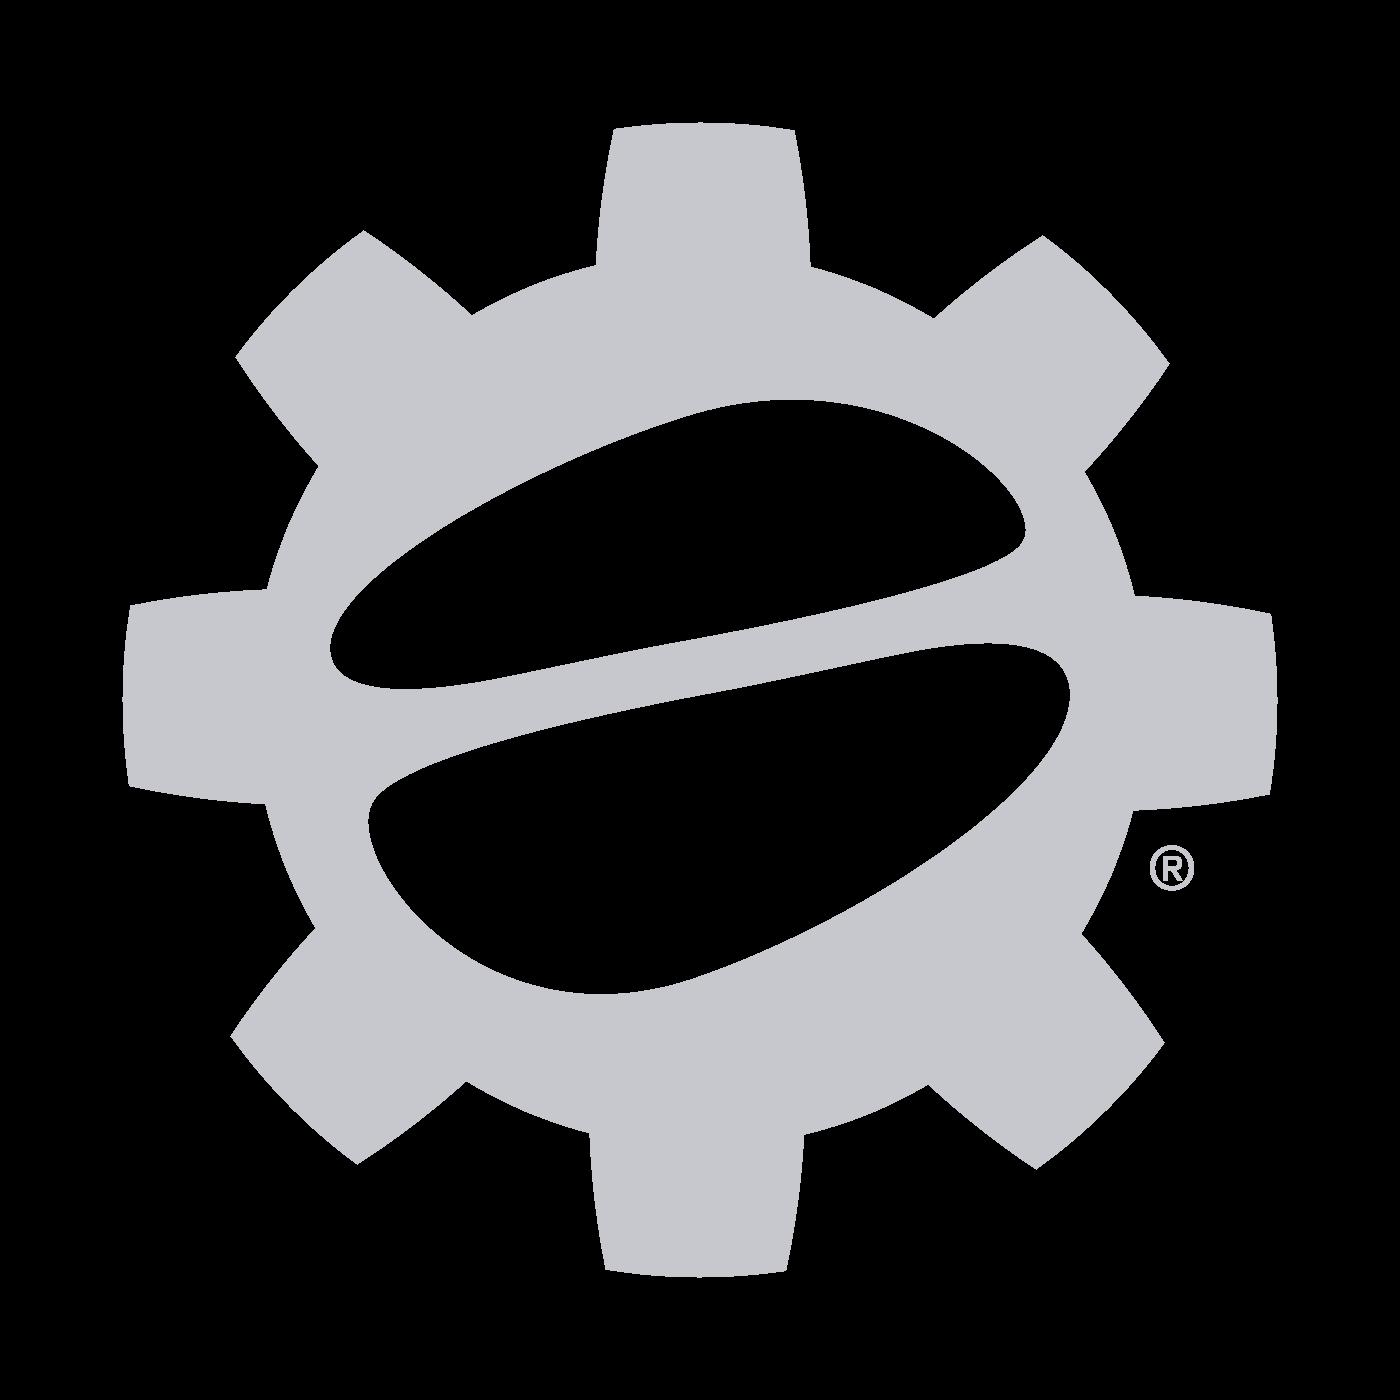 BUNN Full Size Iced Tea Brewer - Dispenser Not Included